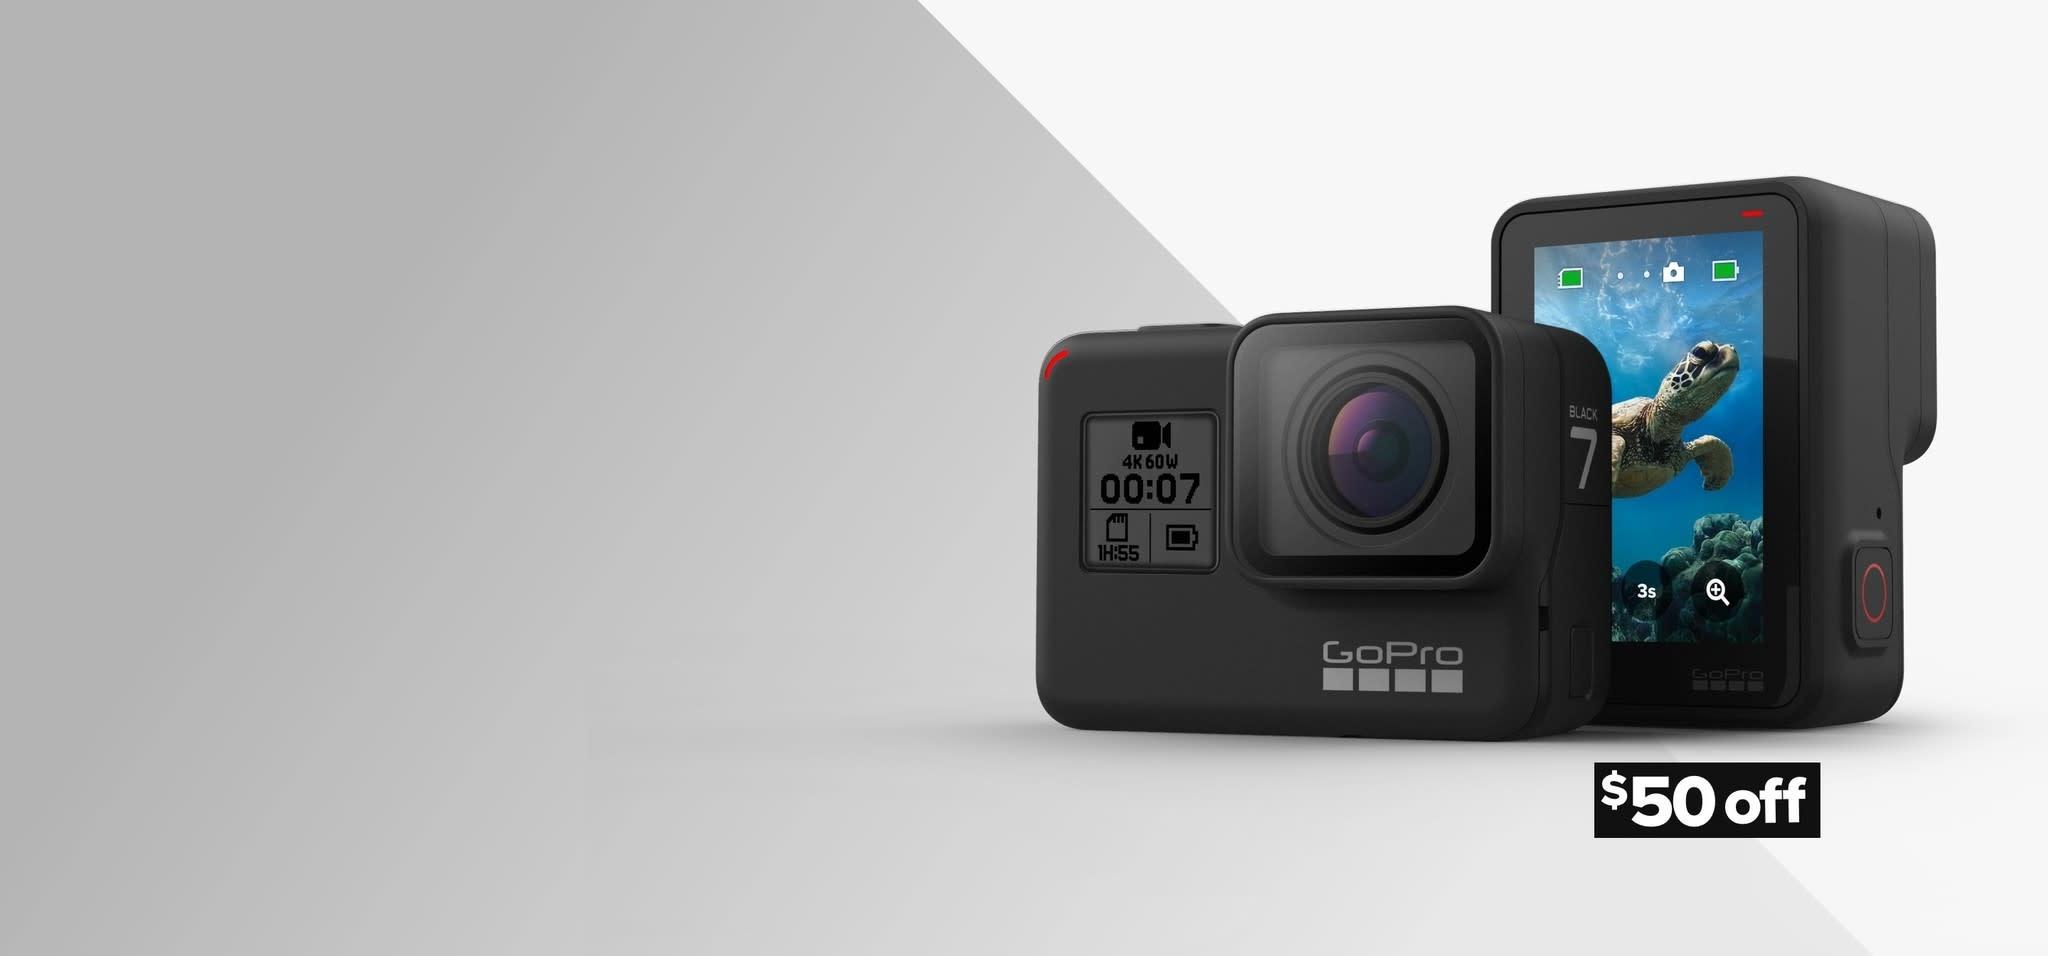 GoPro GoPro HERO7 Black w/ SD Card